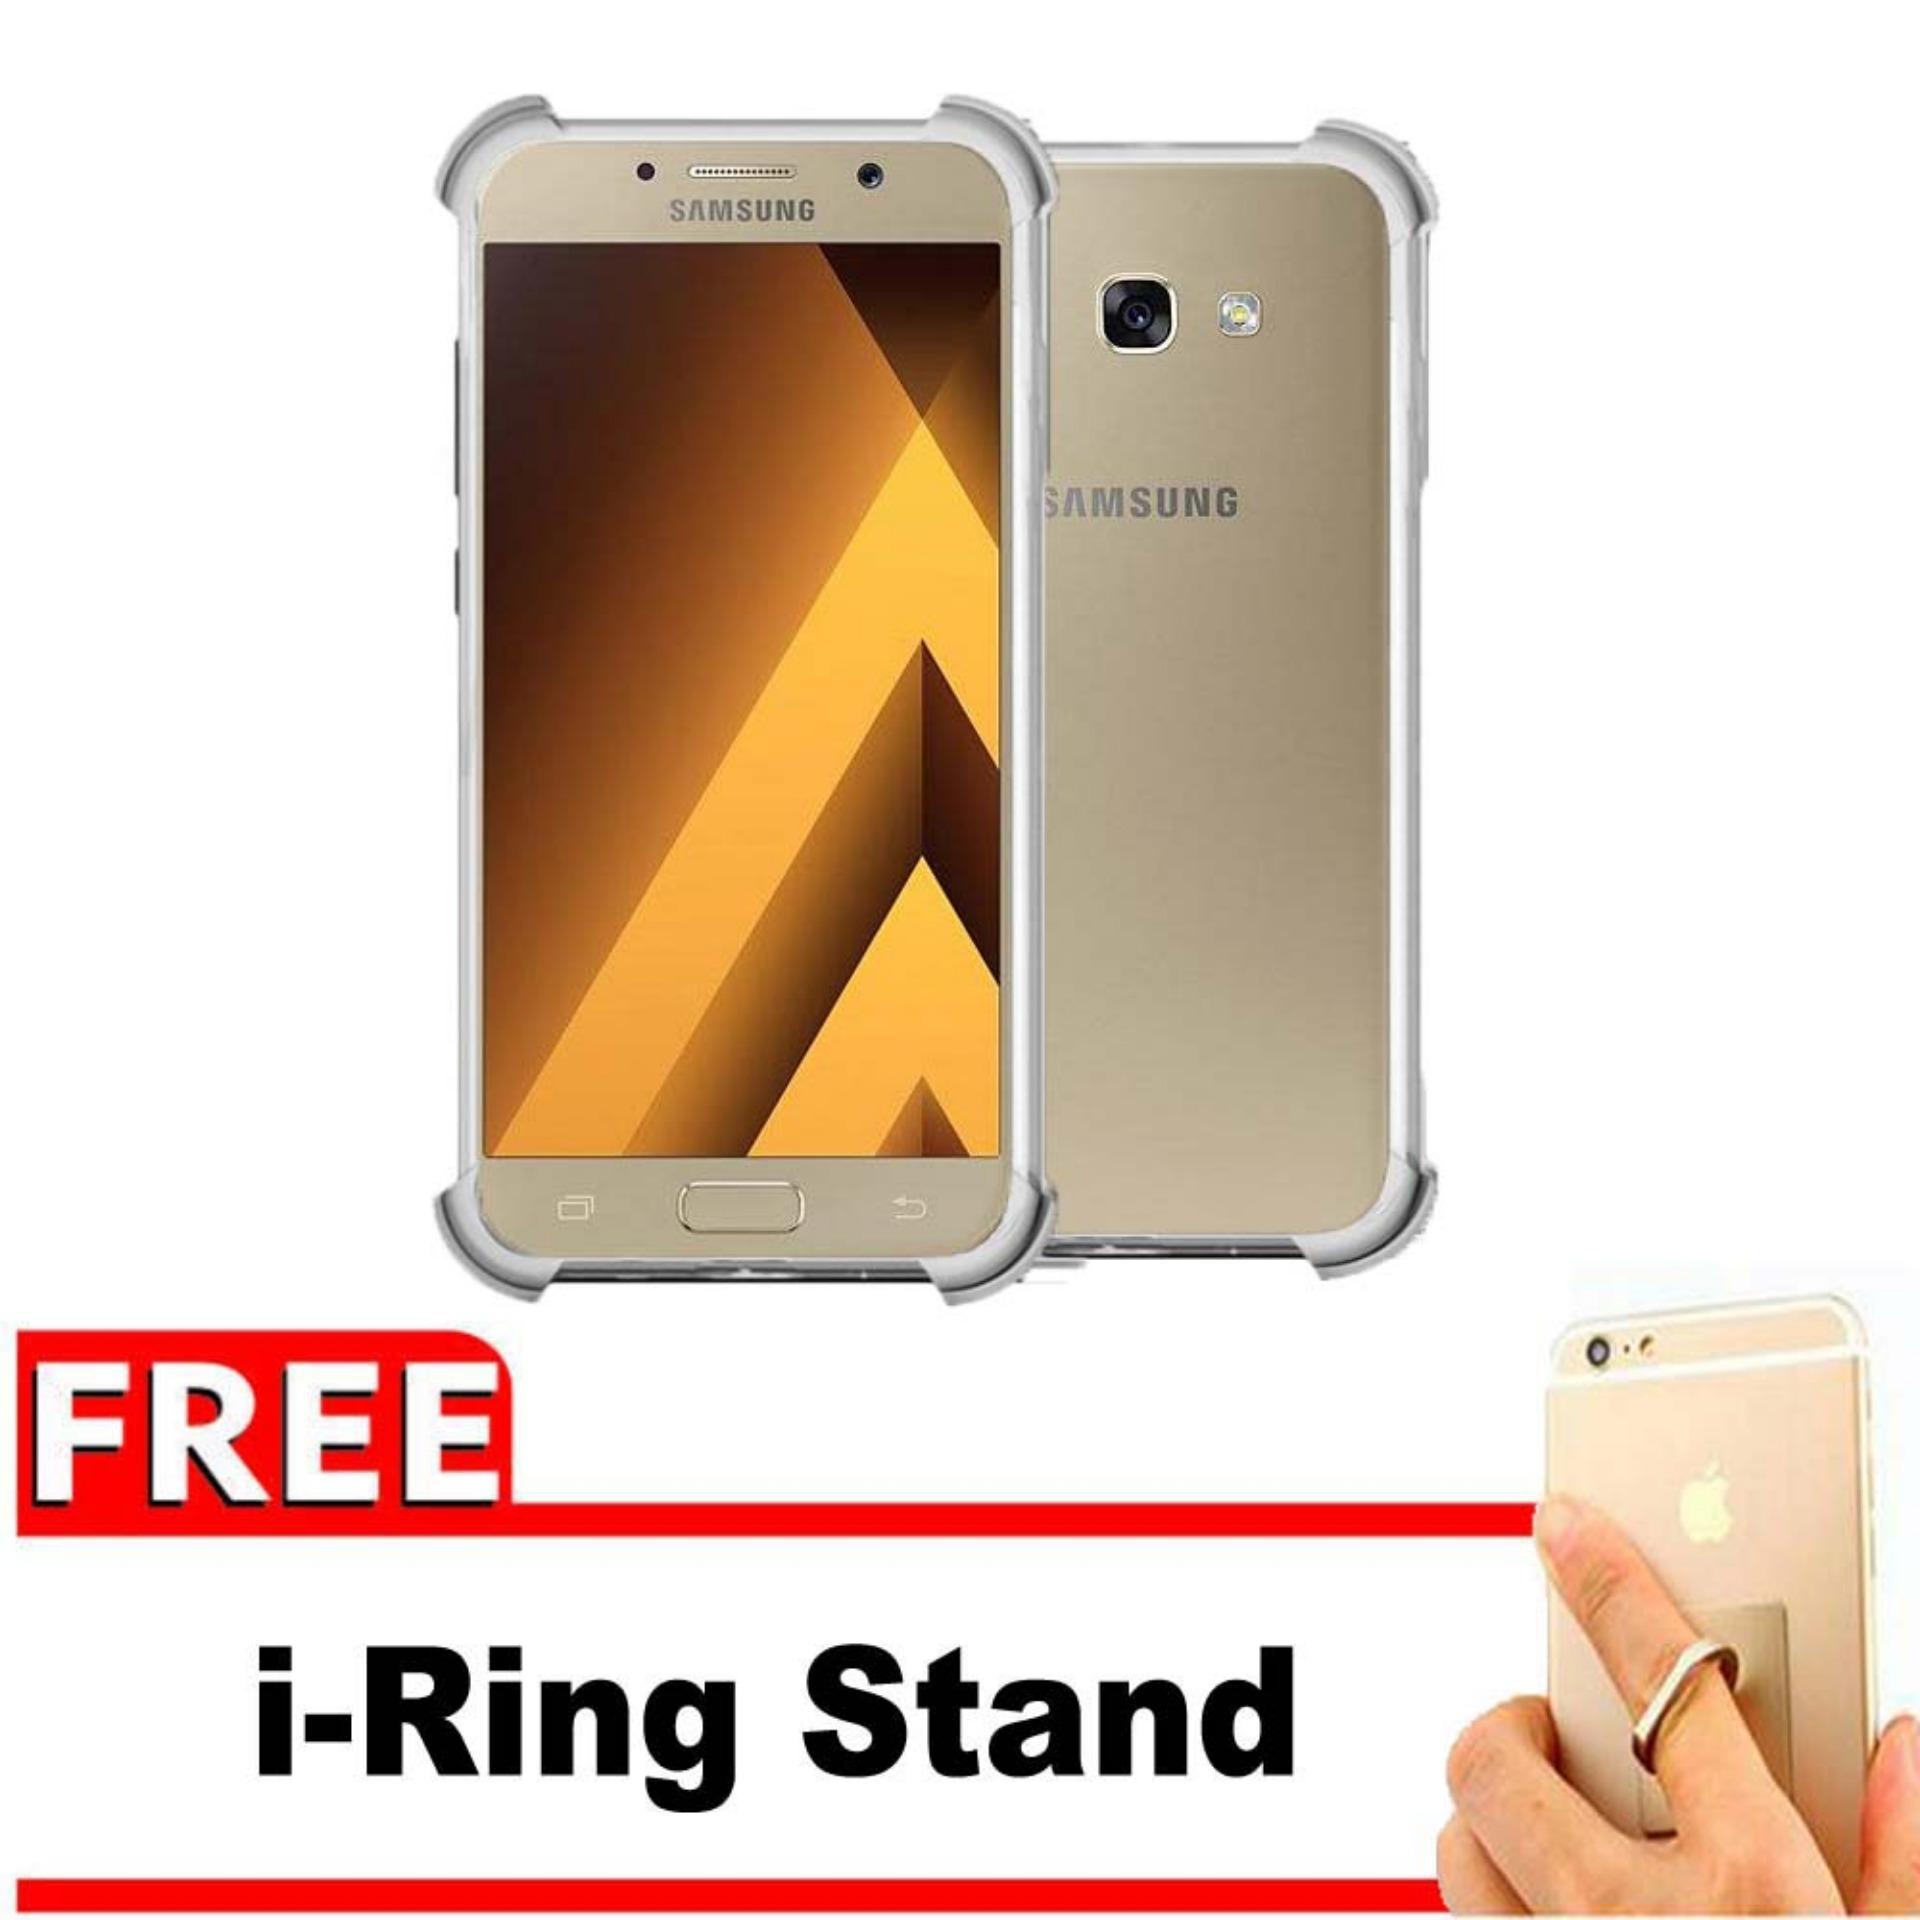 Kelebihan Softcase Anti Crack Anti Shock For Samsung Galaxy J2 Prime Source · for Samsung Galaxy